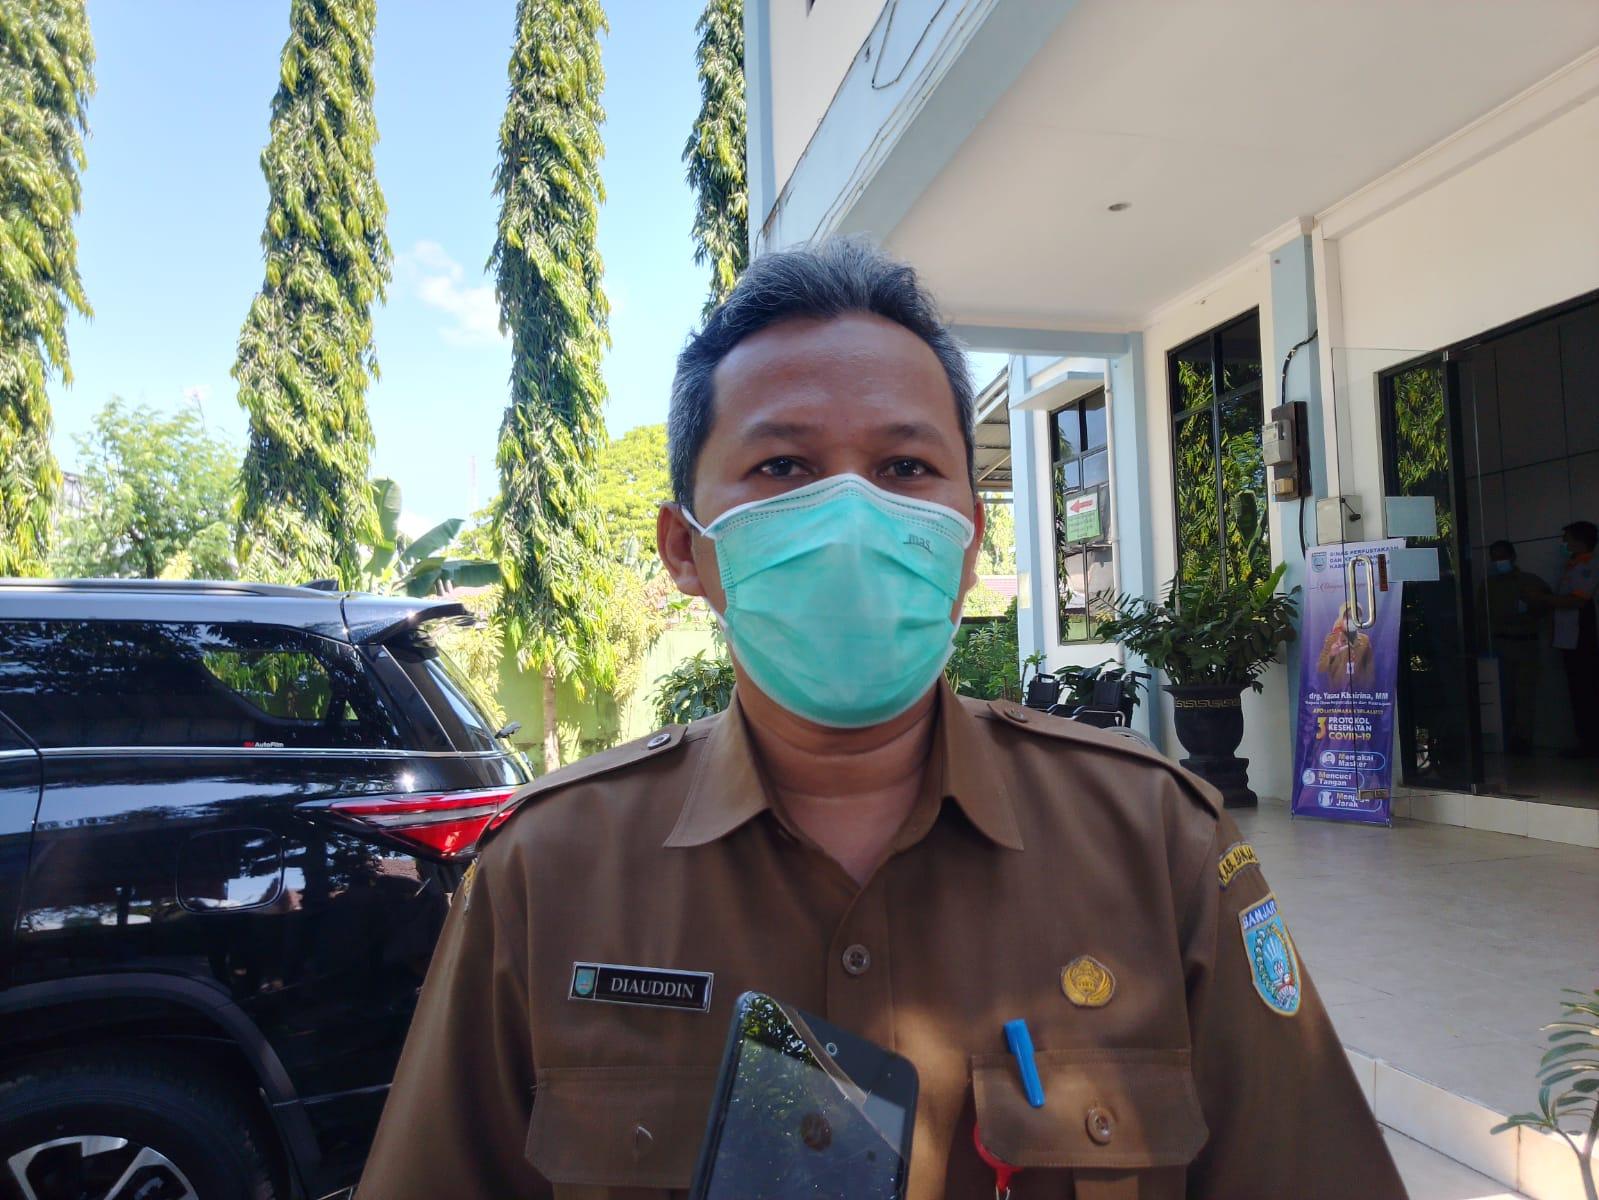 Kepala Dinkes Kabupaten Banjar dr. Diauddin membenarkan terjadi kenaikan yang signifikan dalam seminggu terakhir